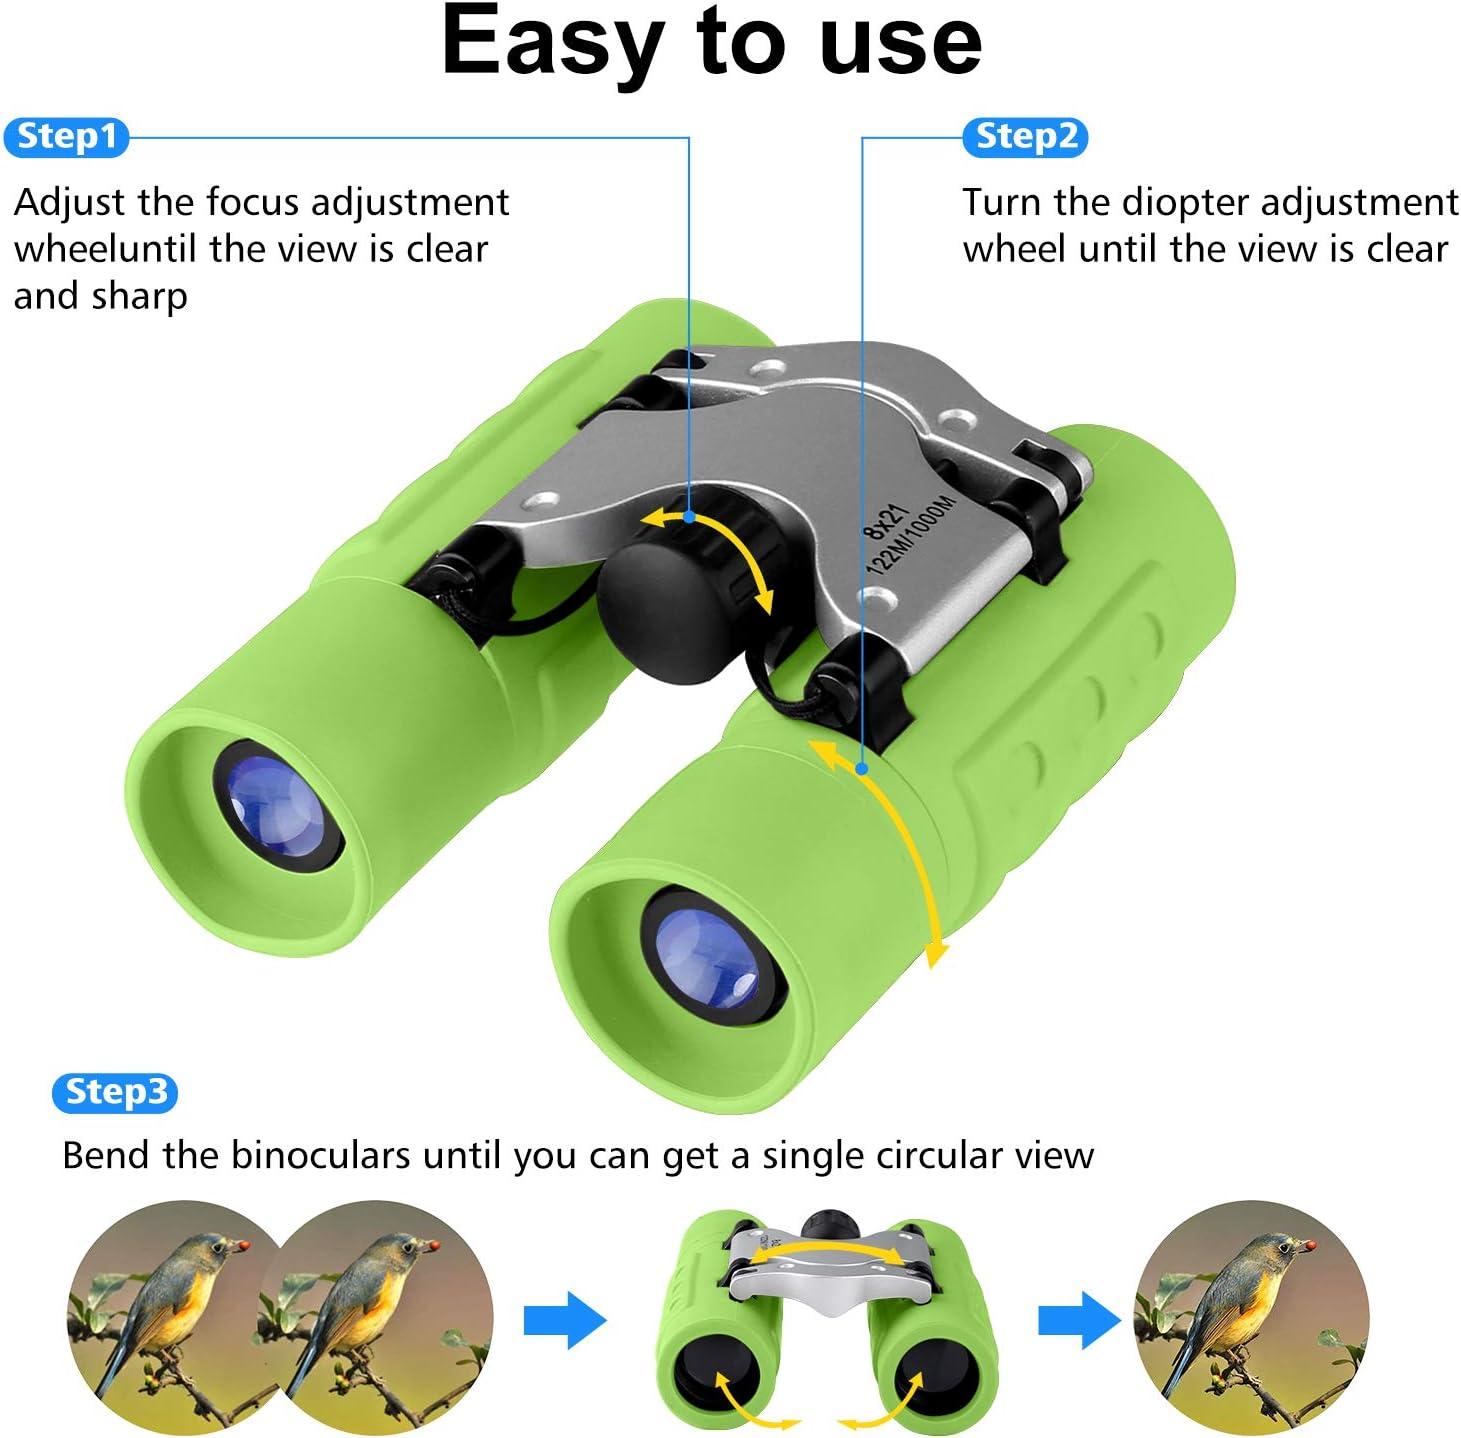 Binoculars for Kids Waterproof Childrens Binoculars for Spy Camping 8 x 21 Real Optics Mini Compact Kids Binoculars with Neck Strap Telescope Toys for 3-12 Years Boys Girls Bird Watching